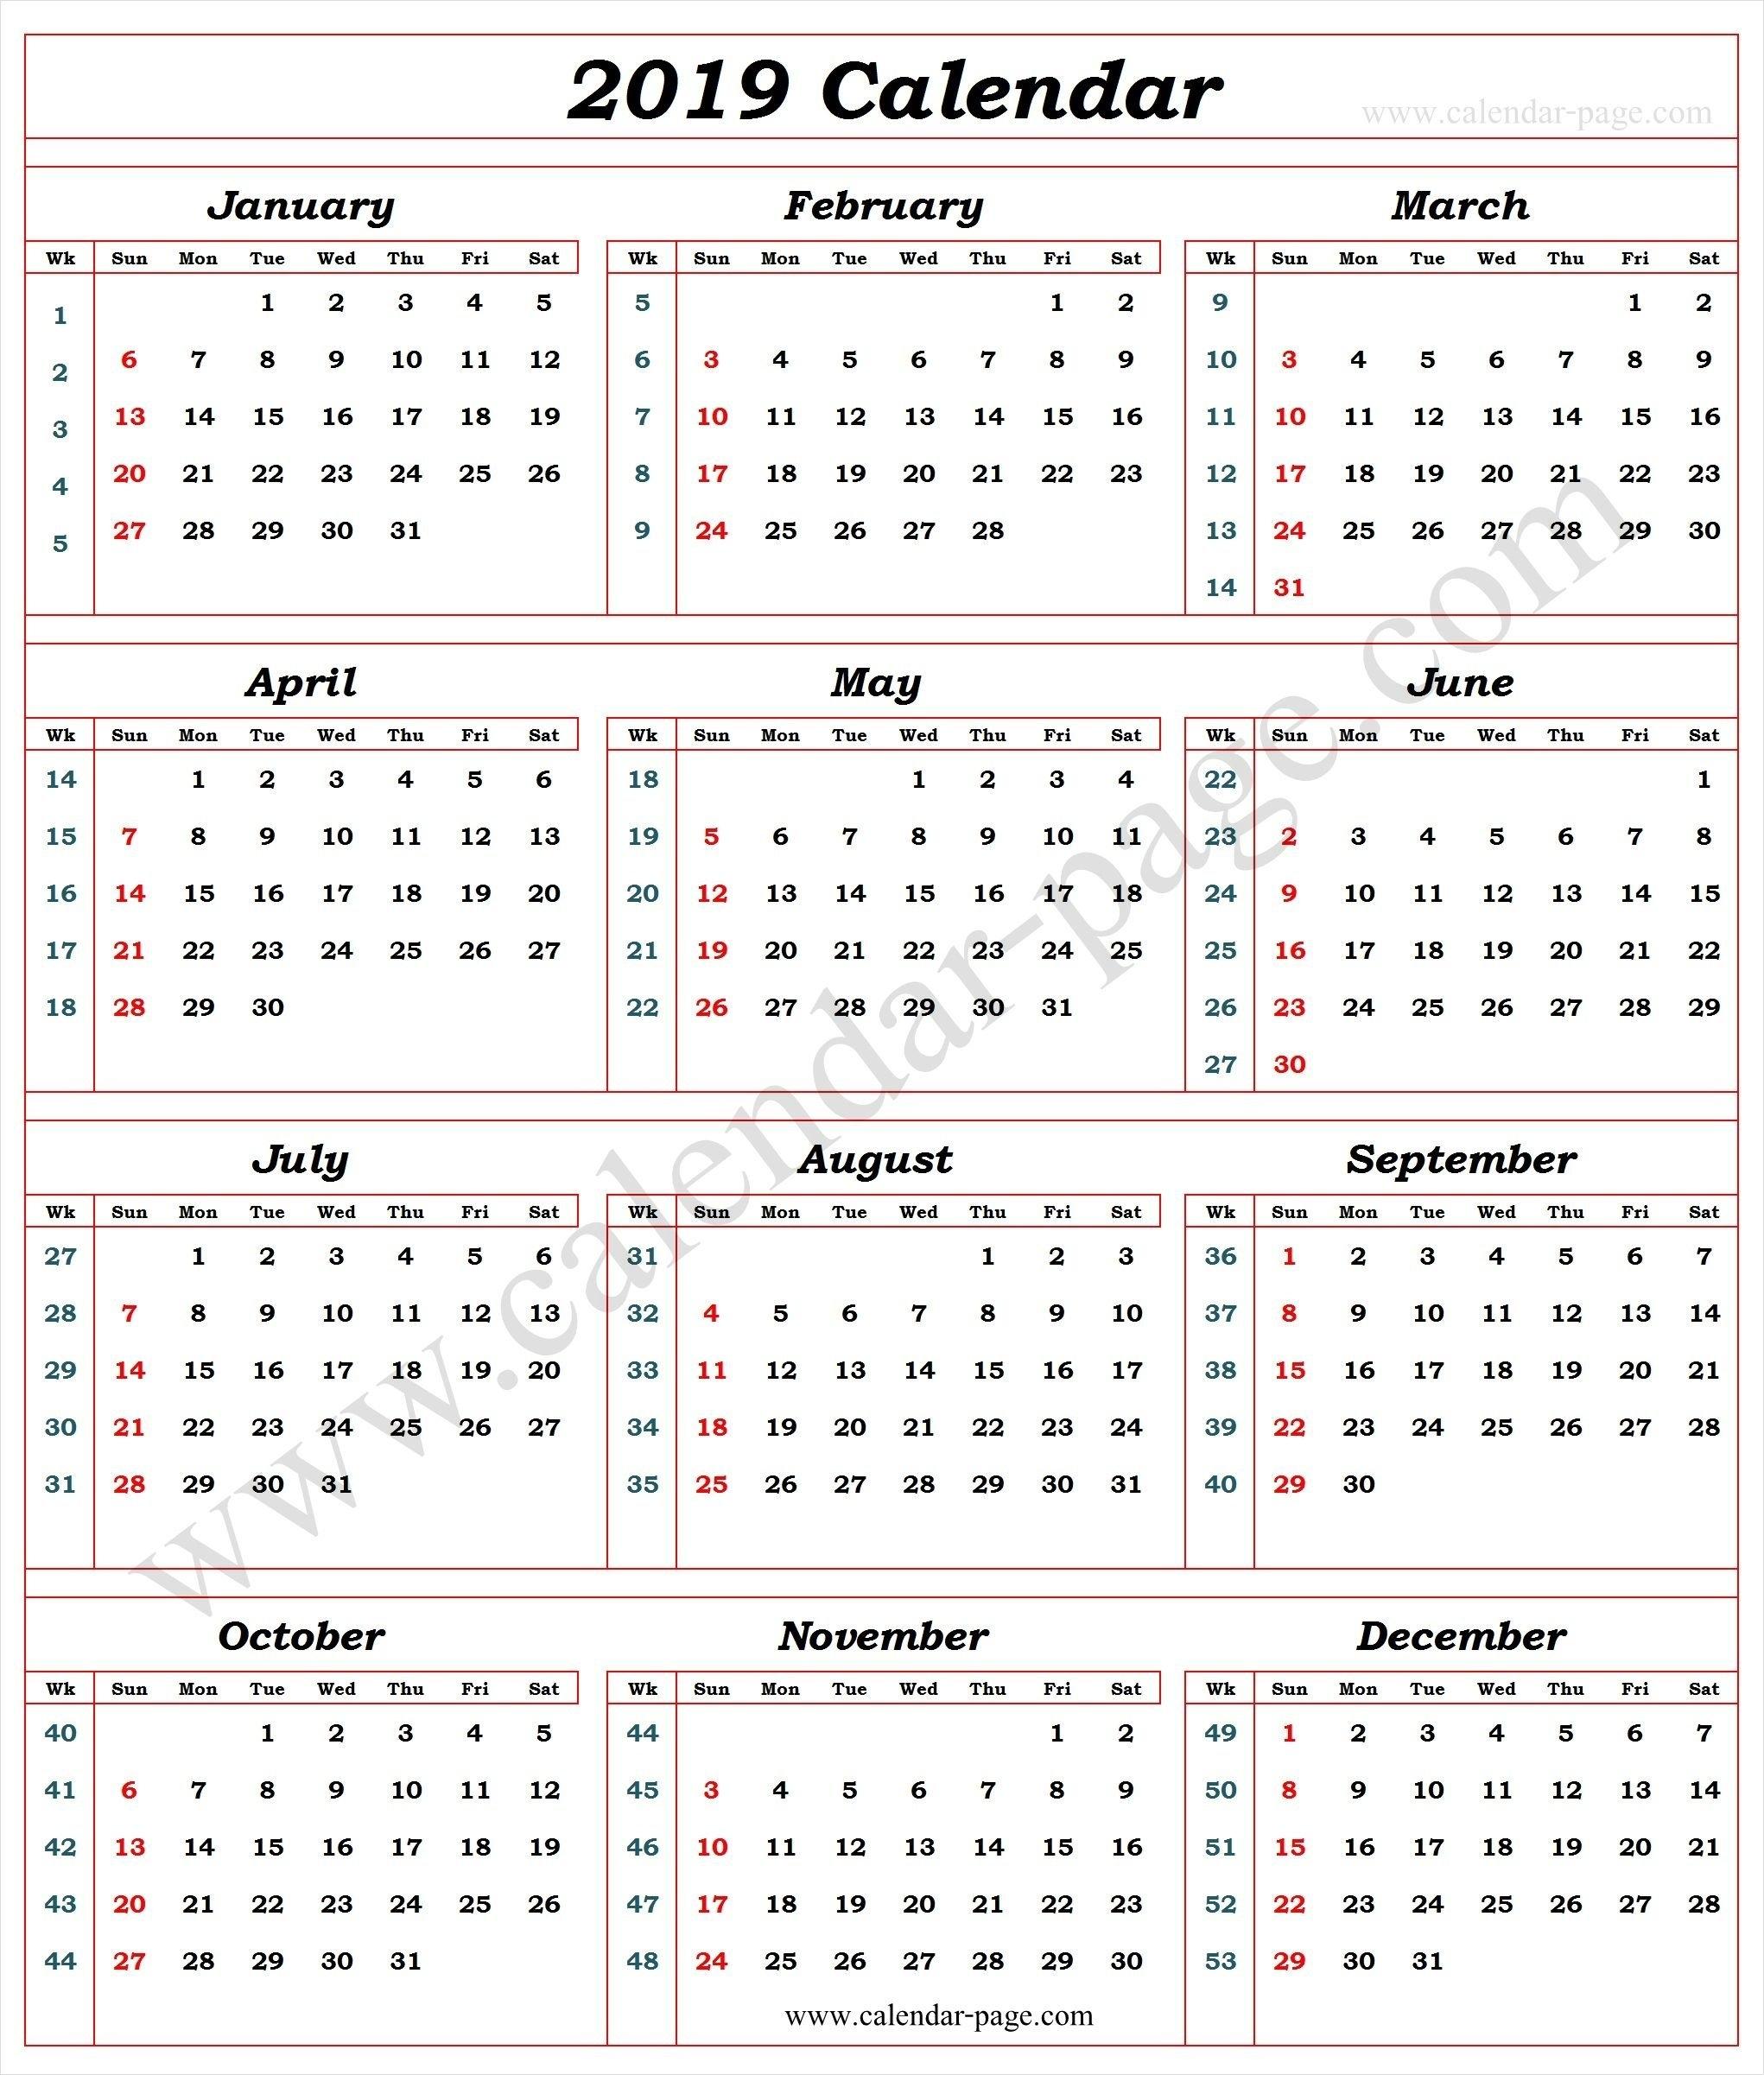 Calendar 2019 With Week Numbers   2019 Calendar Template   Pinterest Calendar Week 7 2019